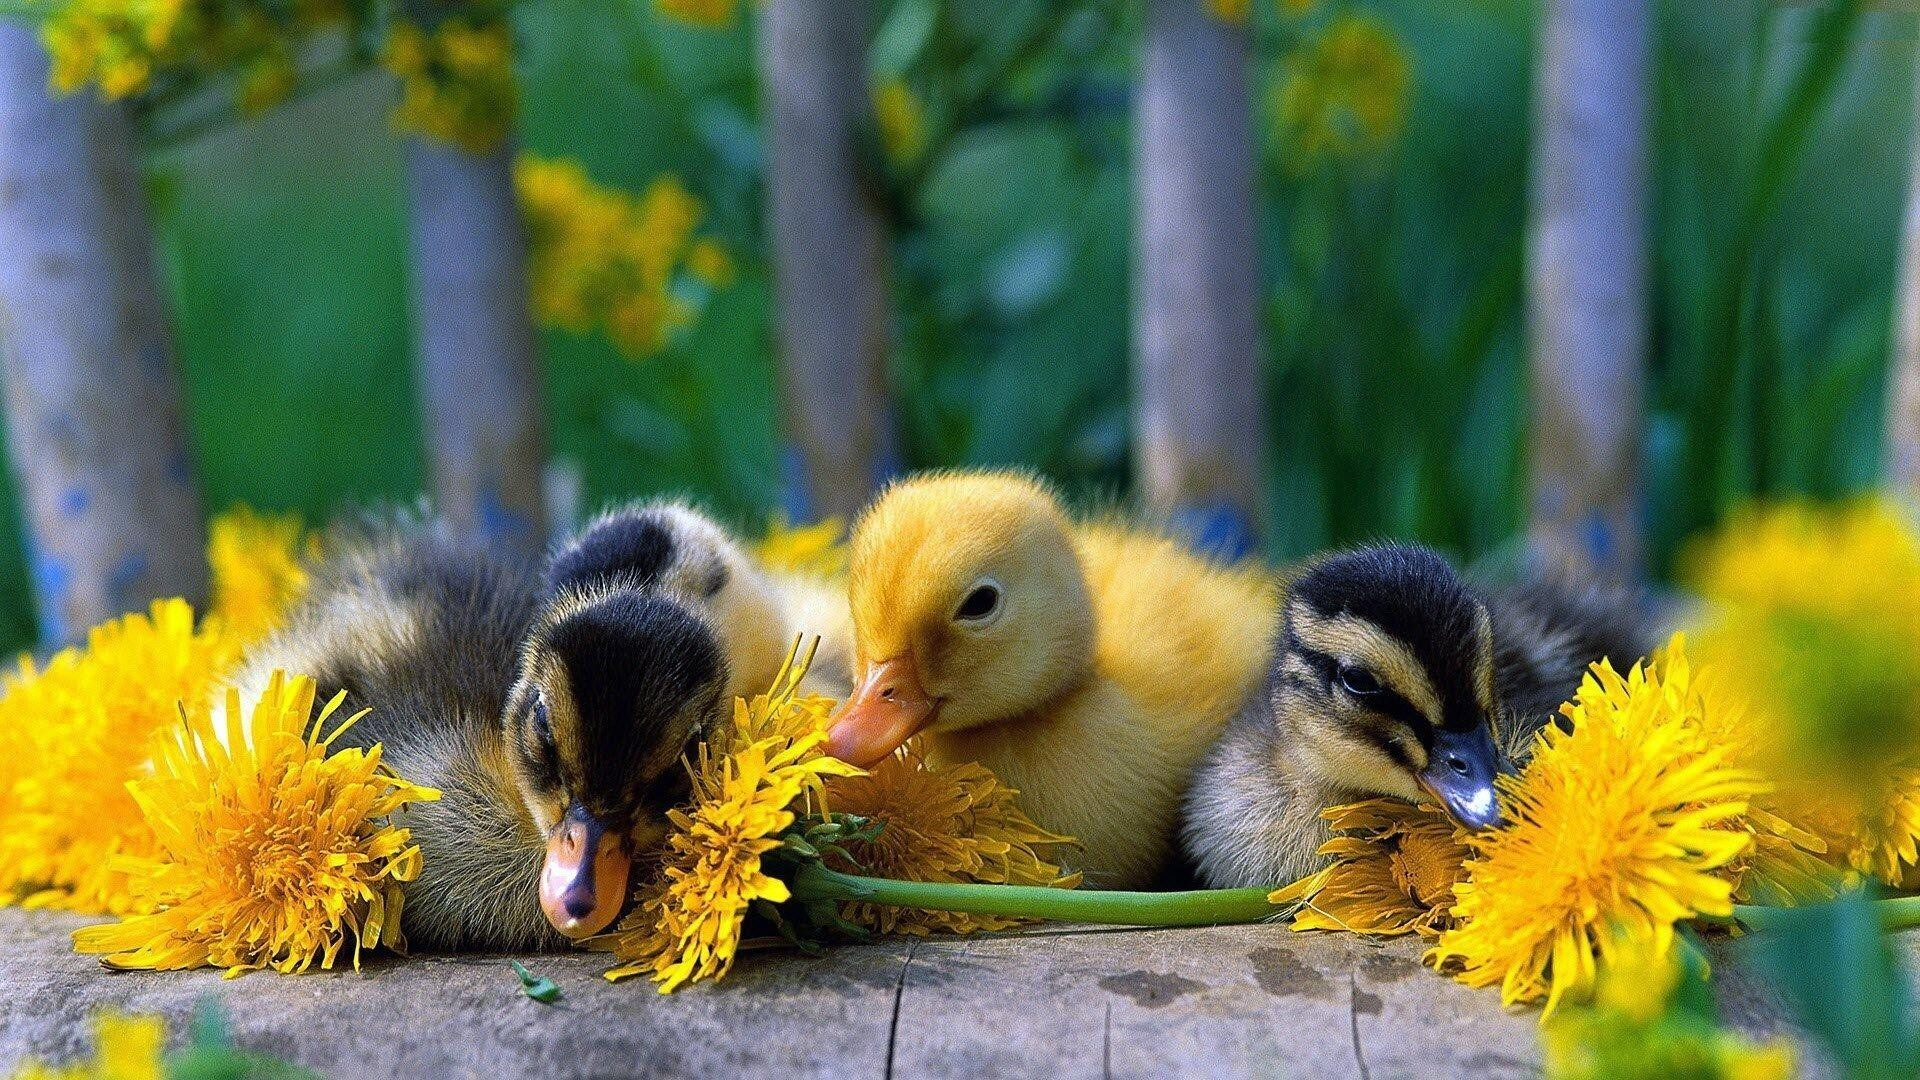 Cute Babies Duck Wallpaper | HD Wallpapers